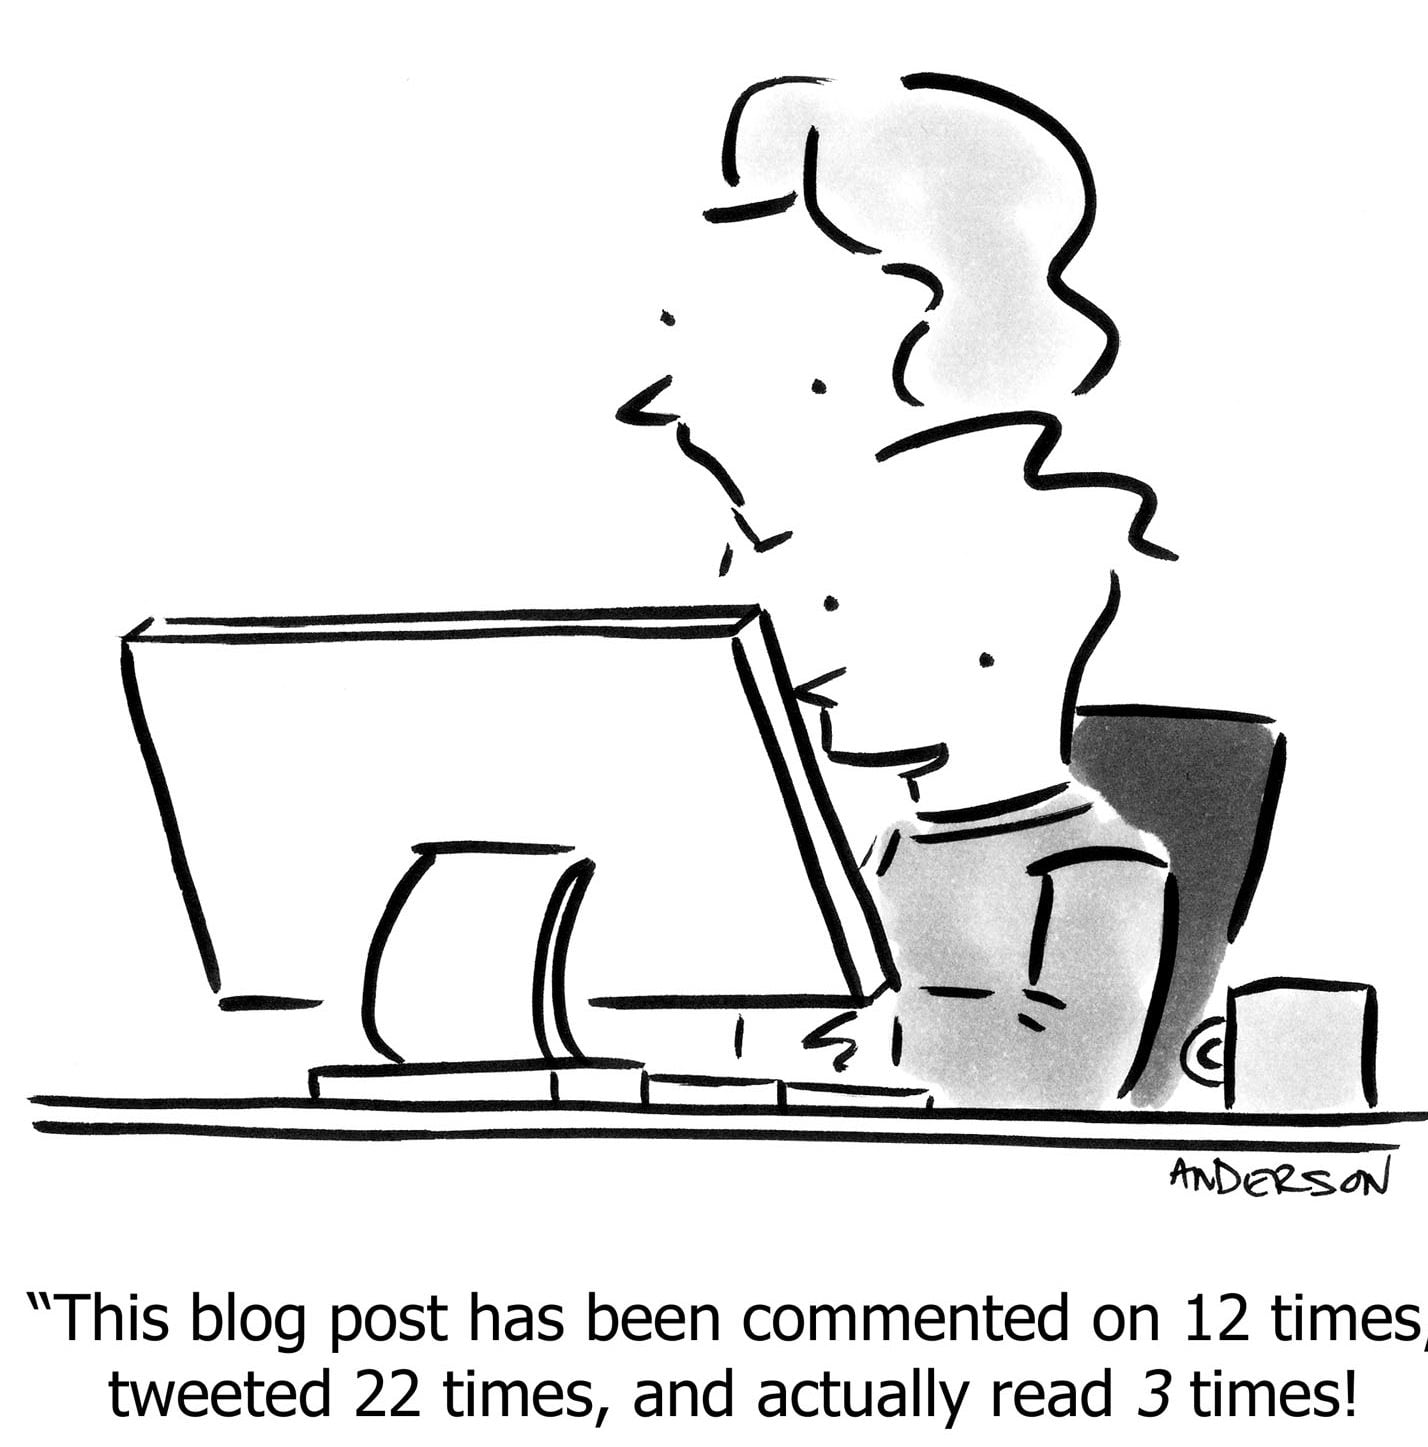 Bloging-cartoon-anderson-e1467803837220.jpg (1428×1447)